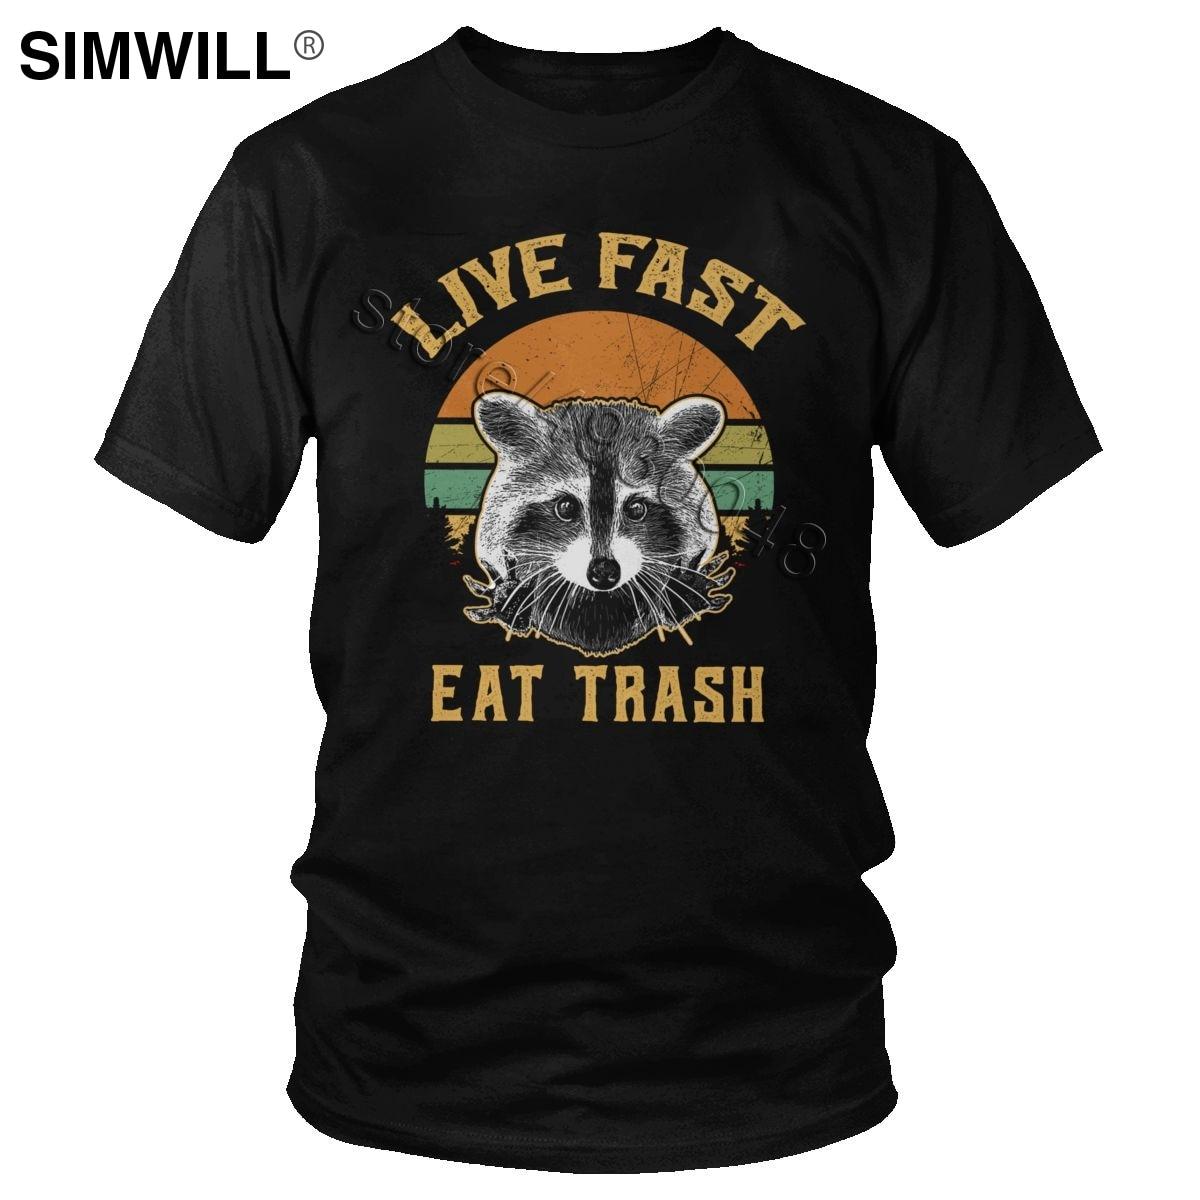 Retro Live Fast Eat Trash Raccoon Tshirt Mens Pure Cotton Racoon Shirts Short Sleeve Round Collar Panda T-shirt Summer Tees Gift